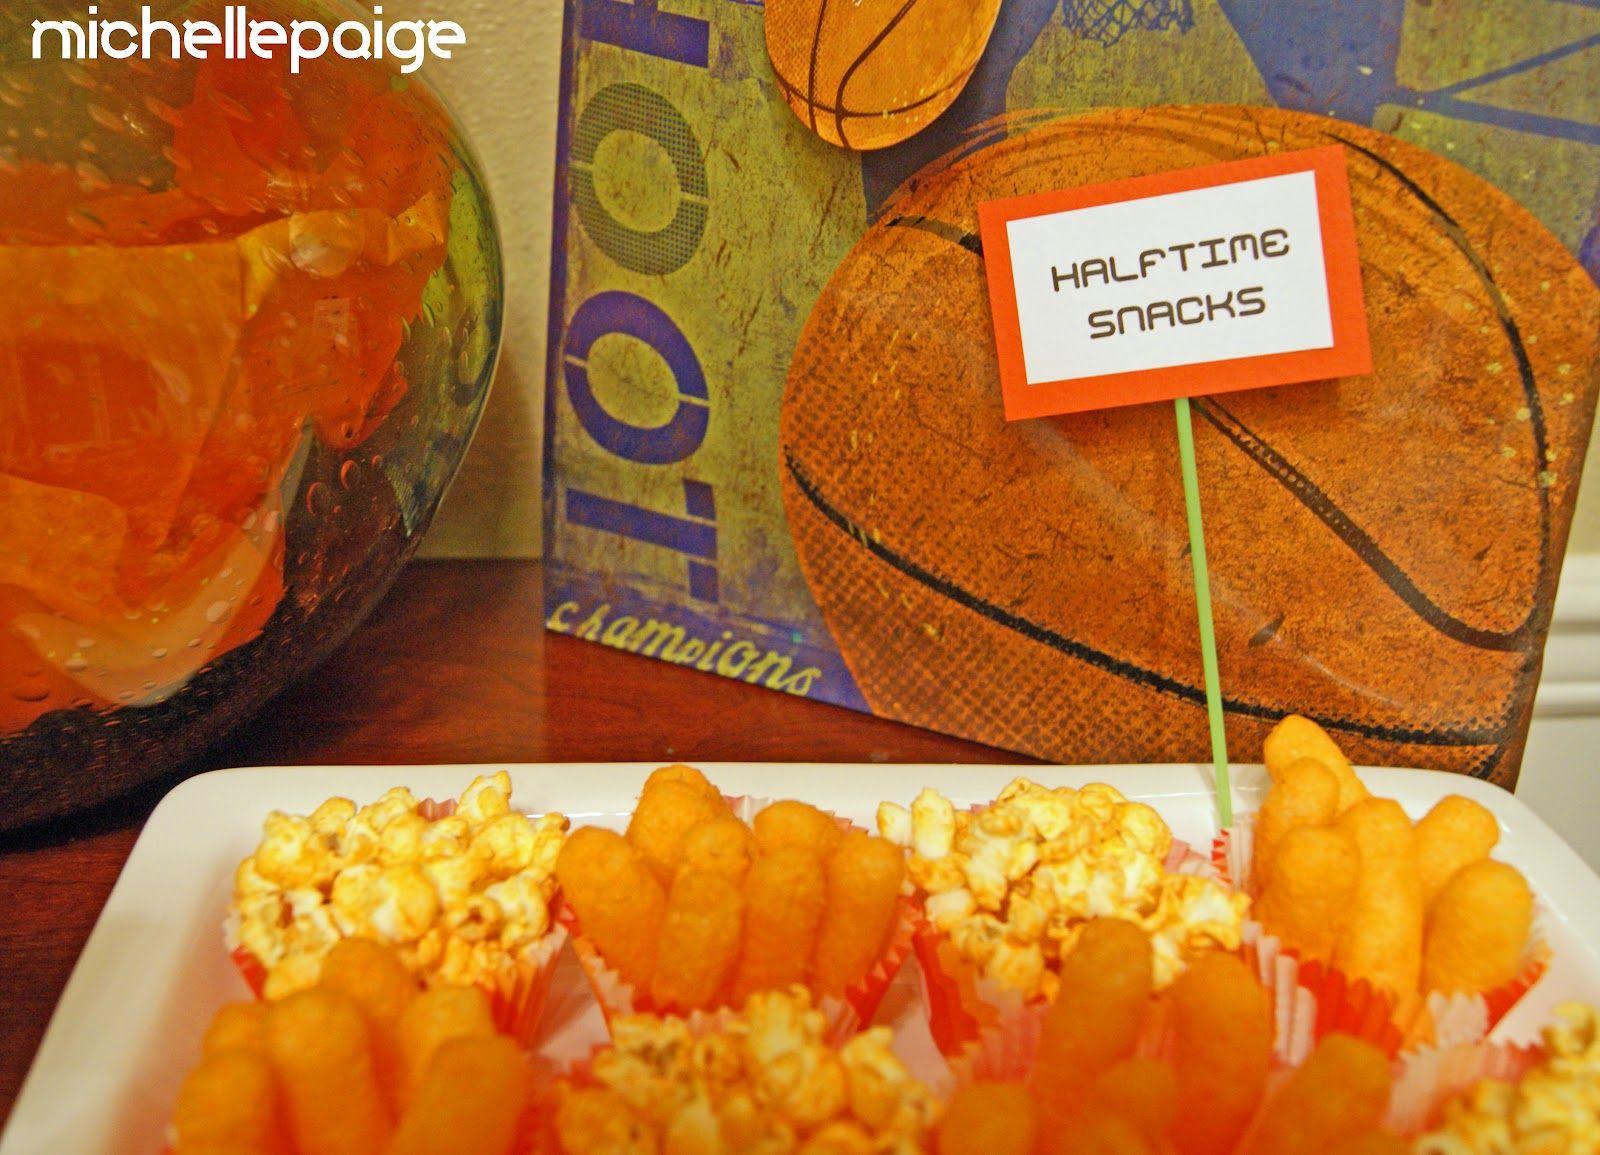 Google Image Result for http://4.bp.blogspot.com/-WVPs6b-42bk/T00yxc0JVpI/AAAAAAAAD9o/z0hnA5I_XTQ/s1600/Basketball+Party+snacks.jpg